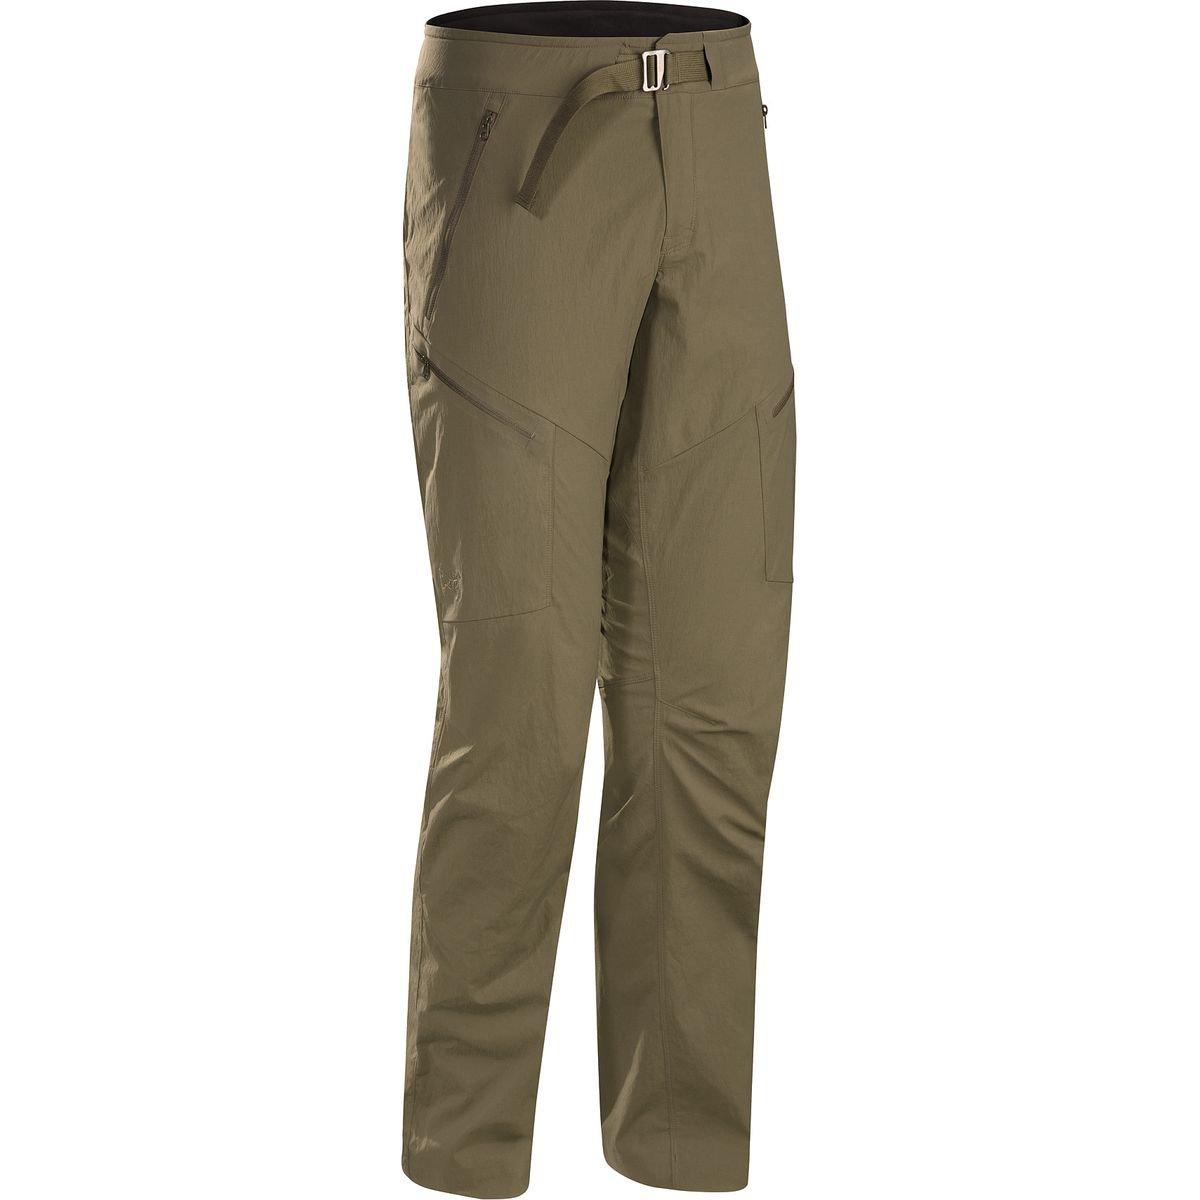 ARC'TERYX(アークテリクス) Palisade Pant Men's パリセード パンツ メンズ 17520 B01GFT0S2E  クォーリー(Quarry) 34W x 30L